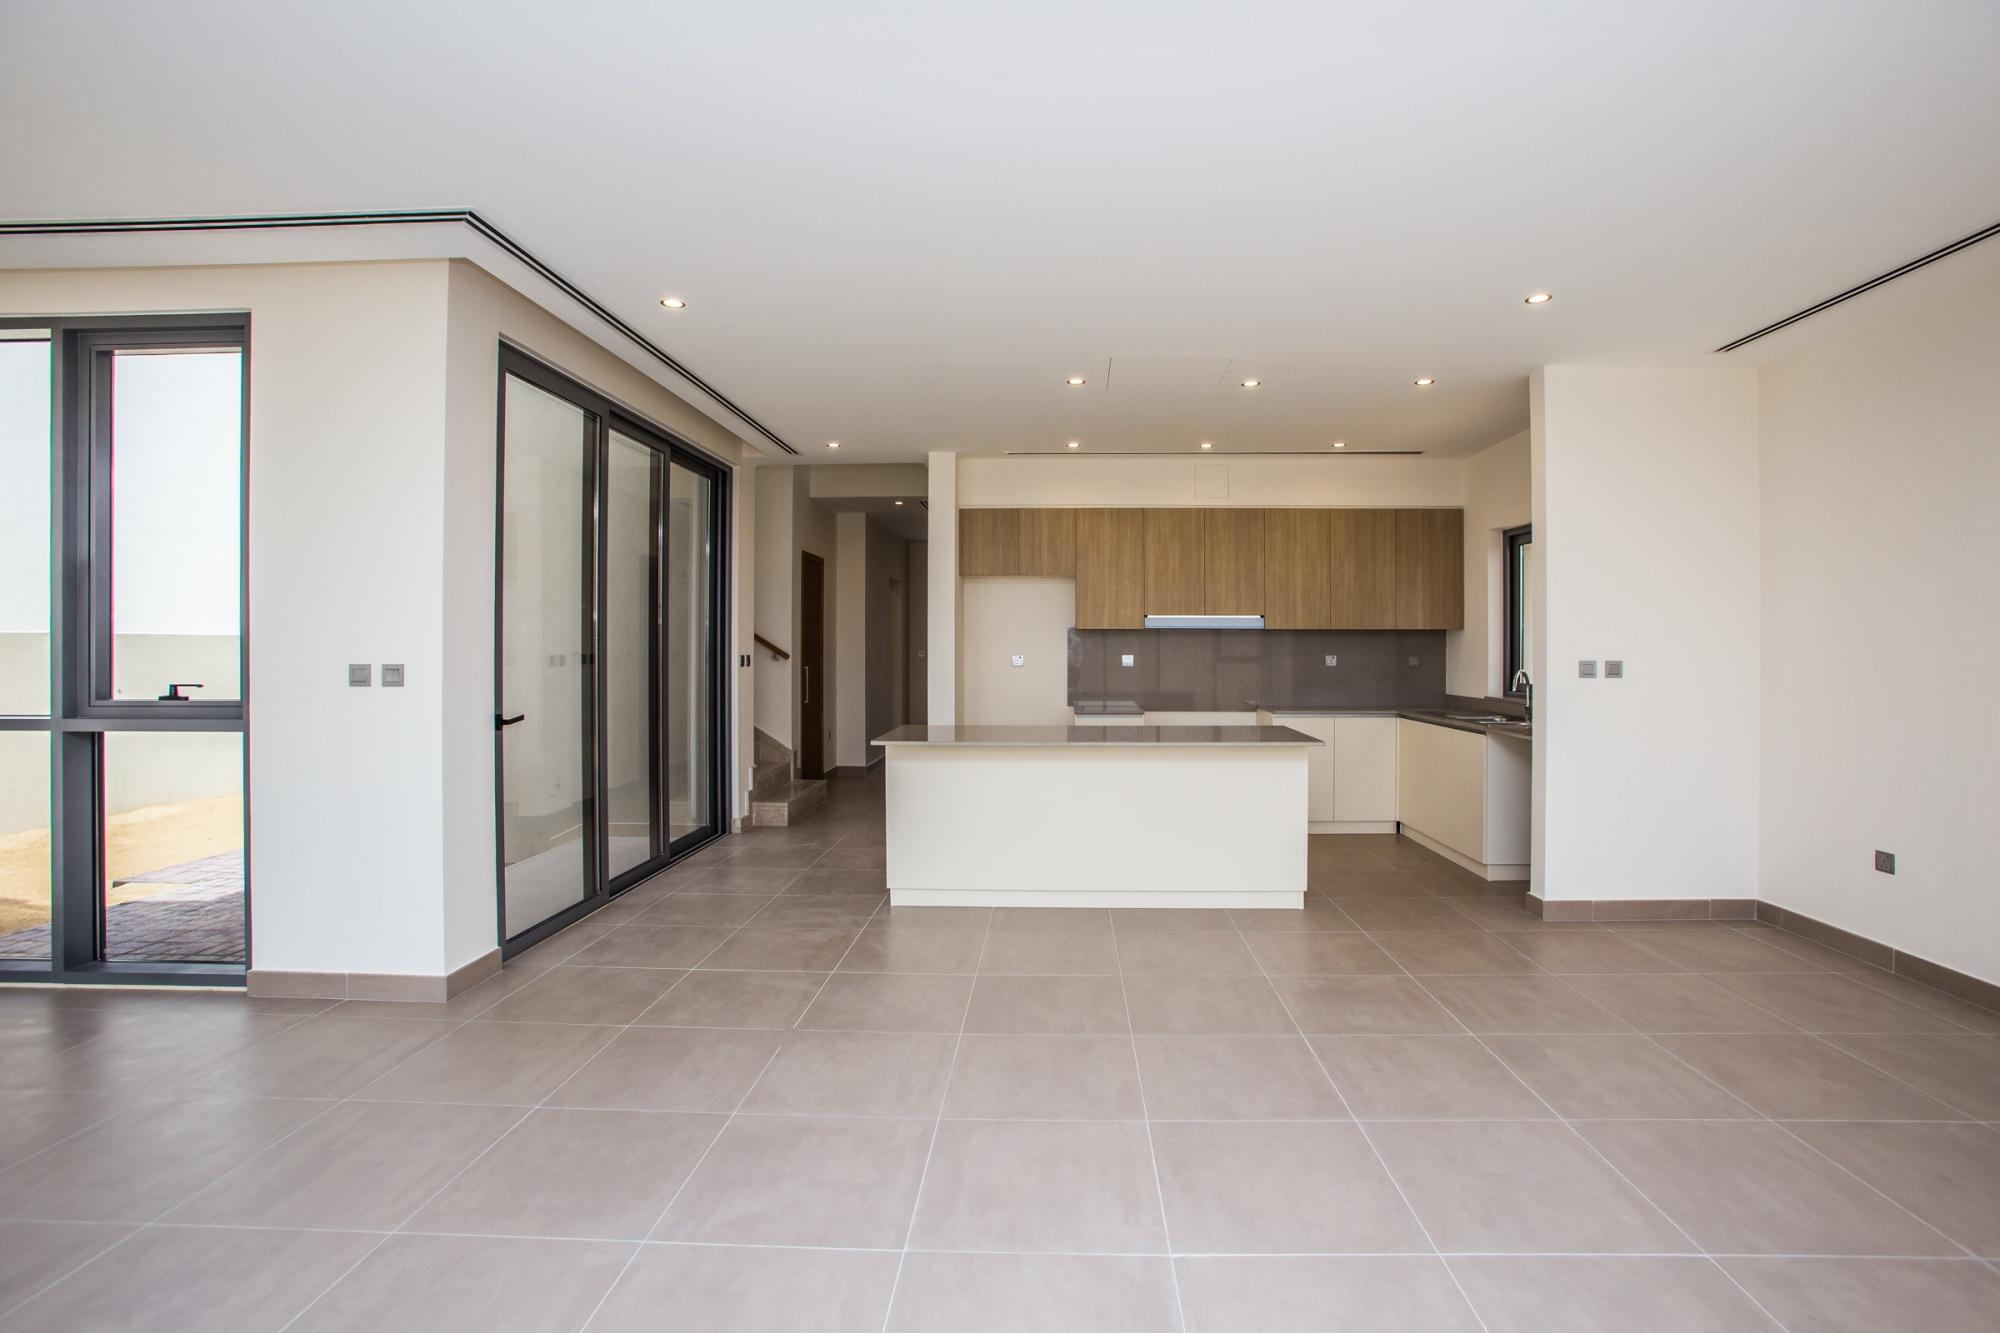 4BRLarge | End Villa Large Plot | Great Location